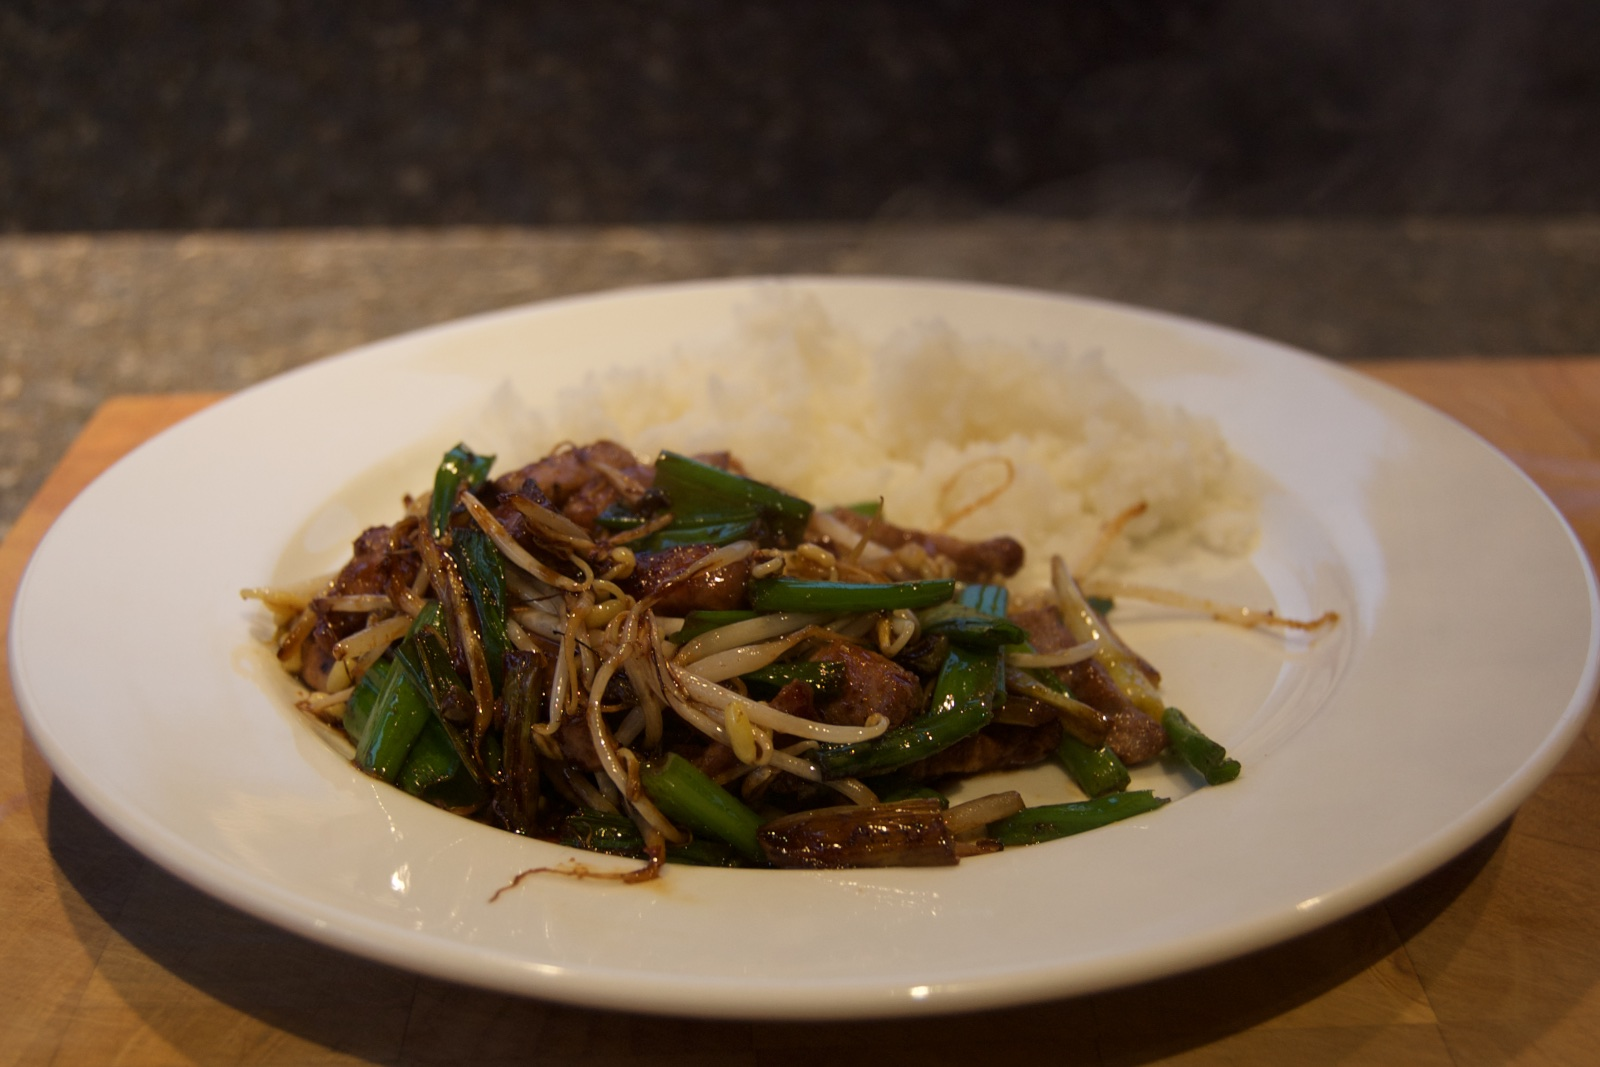 http://blog.rickk.com/food/2015/12/16/ate.2015.12.16.d.jpg